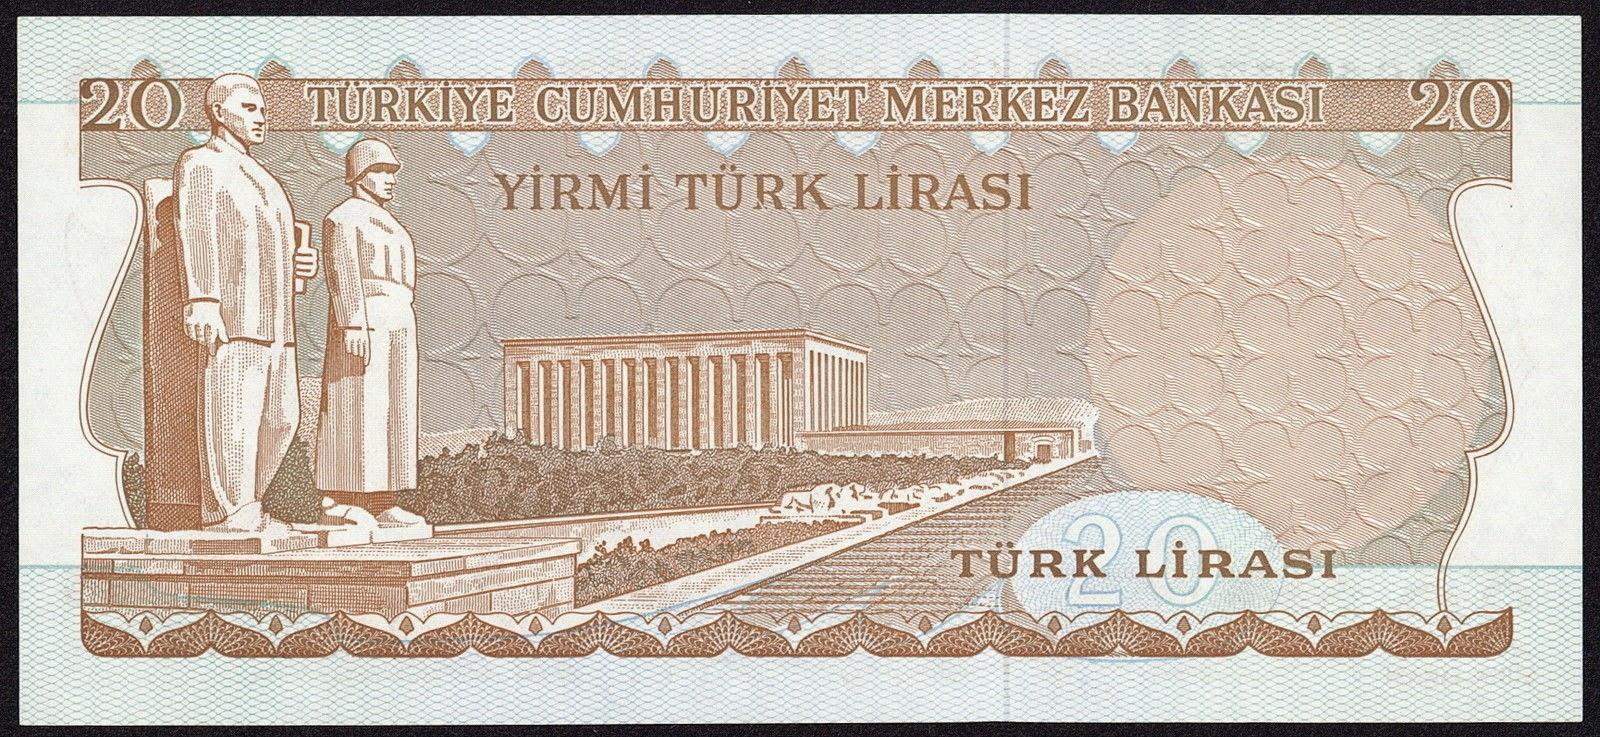 "Turkey currency money 20 Türk Lirasi ""Turkish Lira"" note 1966 Mausoleum of Atatürk in Ankara"